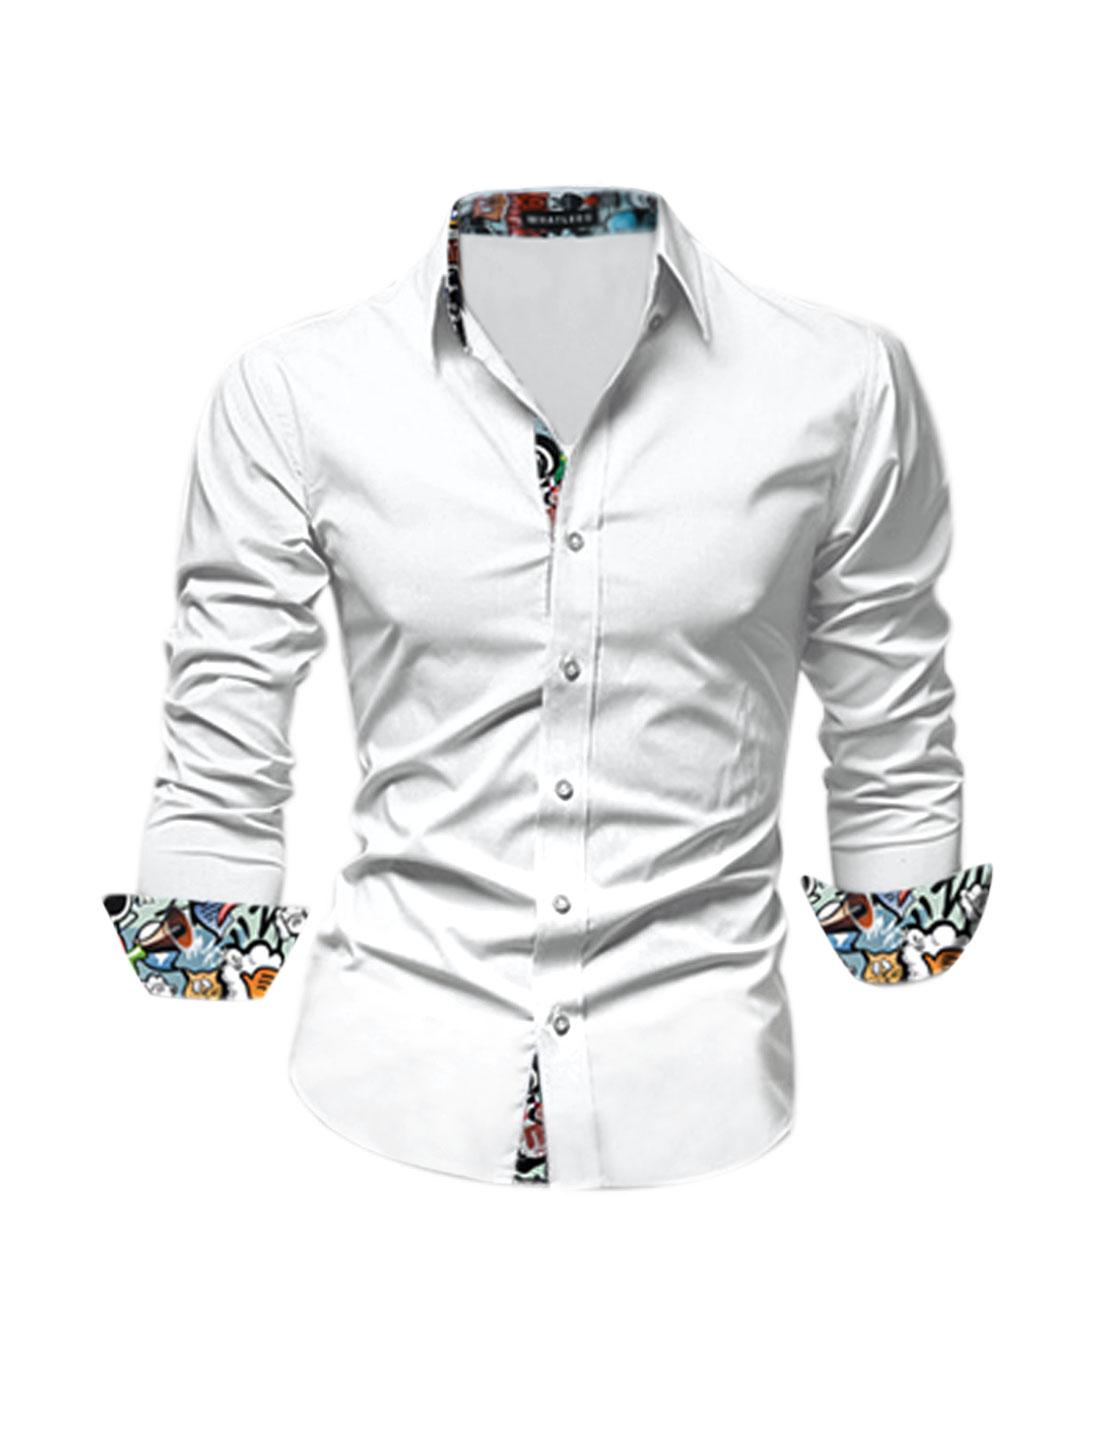 Man Long Sleeves Cartoon Pattern Button Down Slim Fit Shirt White M